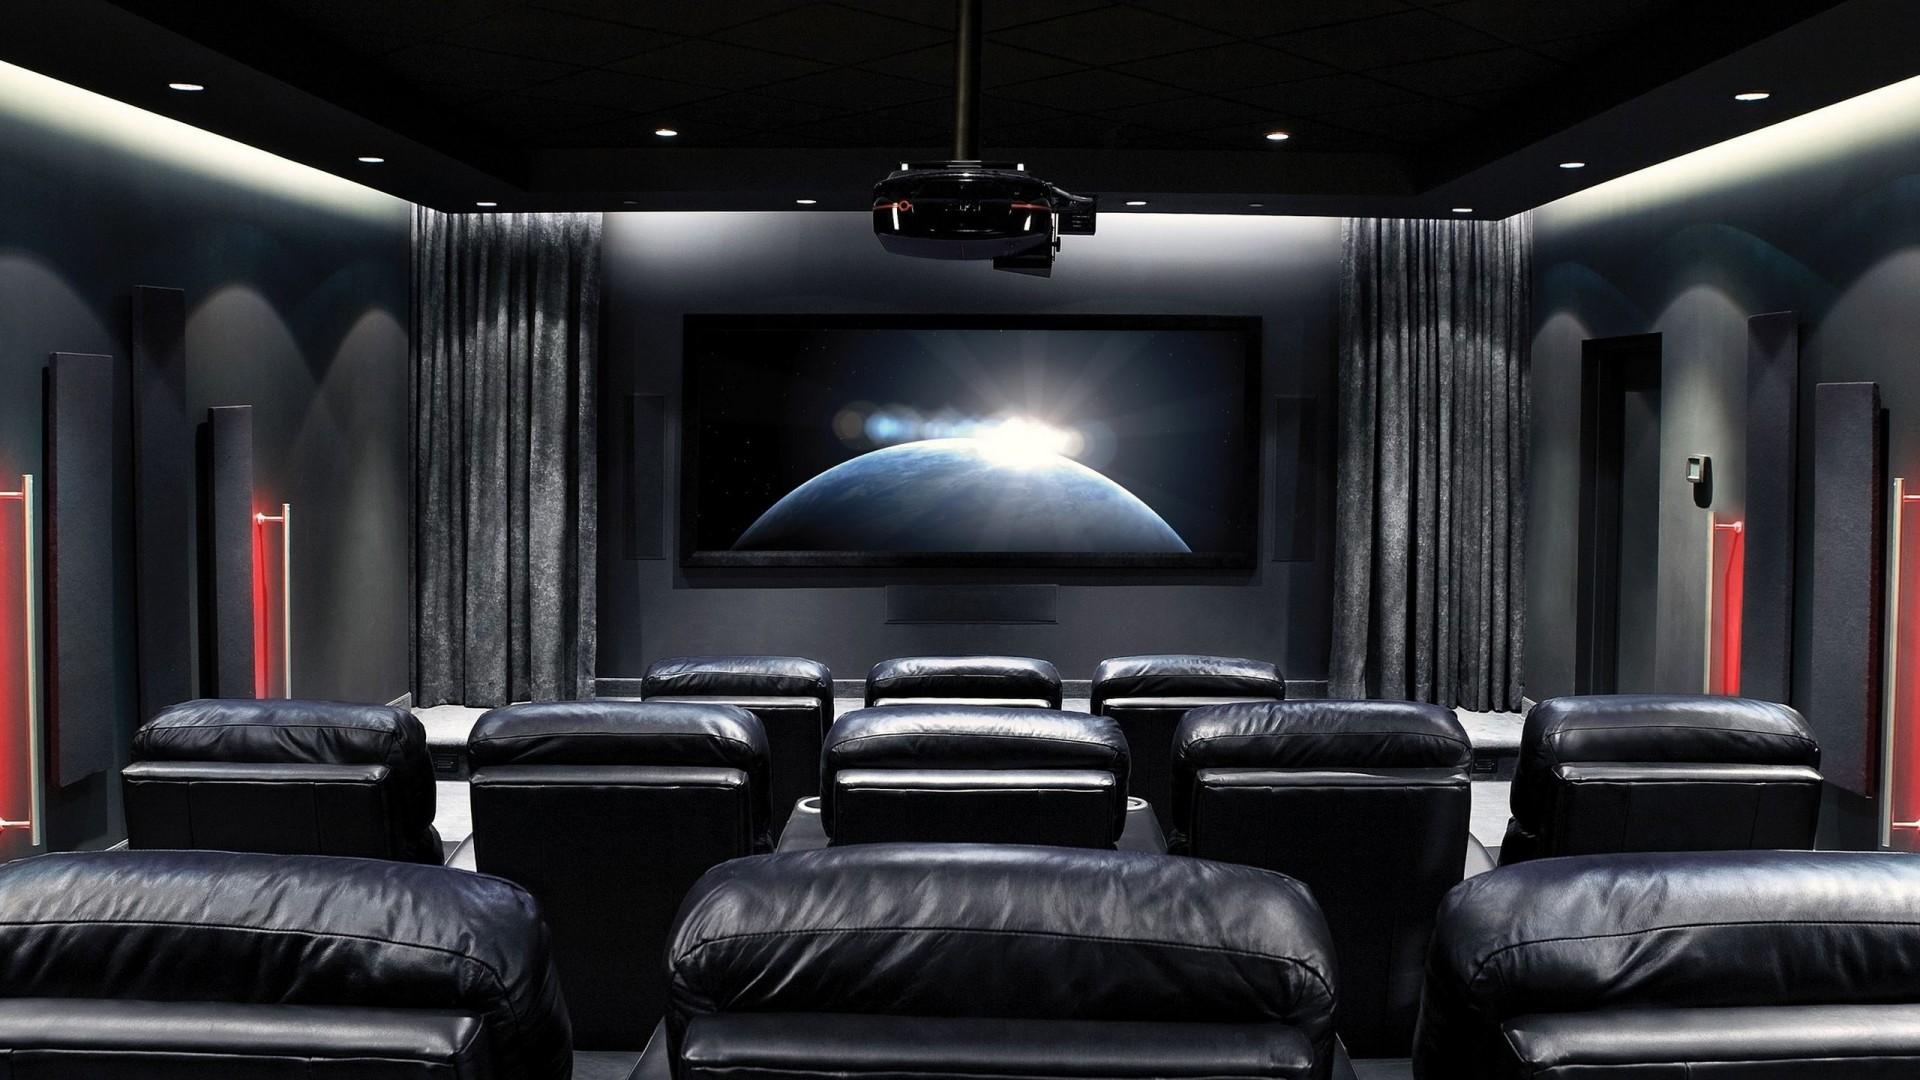 Free Download Cinema Wallpapers Gzsihaicom 1920x1080 For Your Desktop Mobile Tablet Explore 96 Theatre Wallpapers Theatre Wallpapers Theatre Wallpaper Movie Theatre Wallpaper